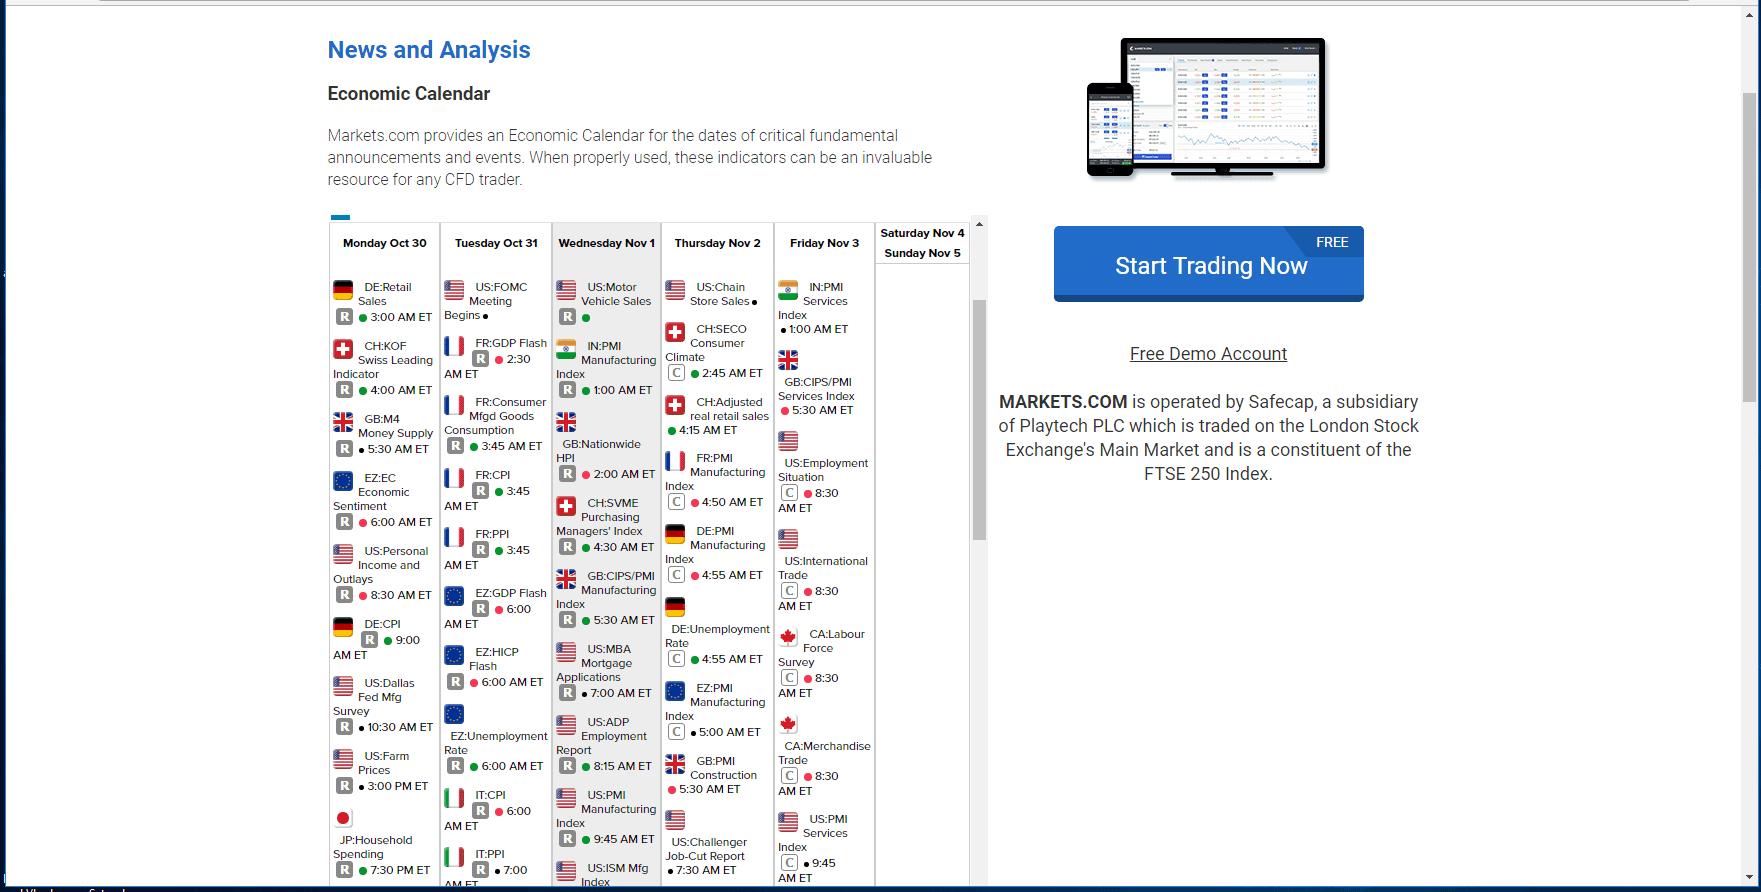 markets.com news and analysis screenshot